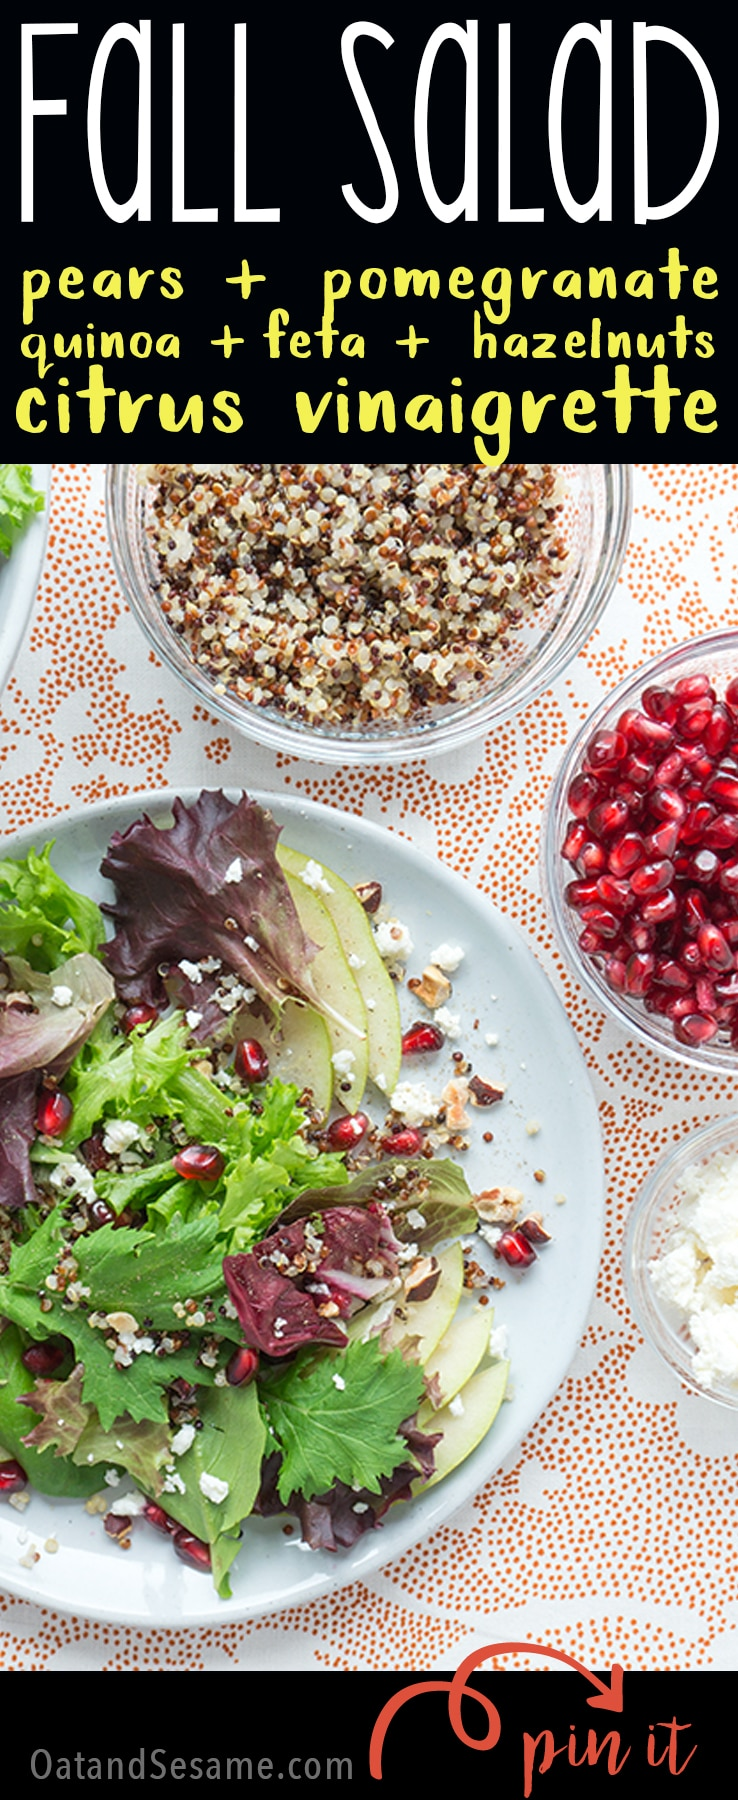 Fall Salad with pear, pomegranate & orange vinaigrette!| SALAD | VEGETARIAN | HEALTHY | FALL | THANKSGIVING | Recipe at OatandSesame.com